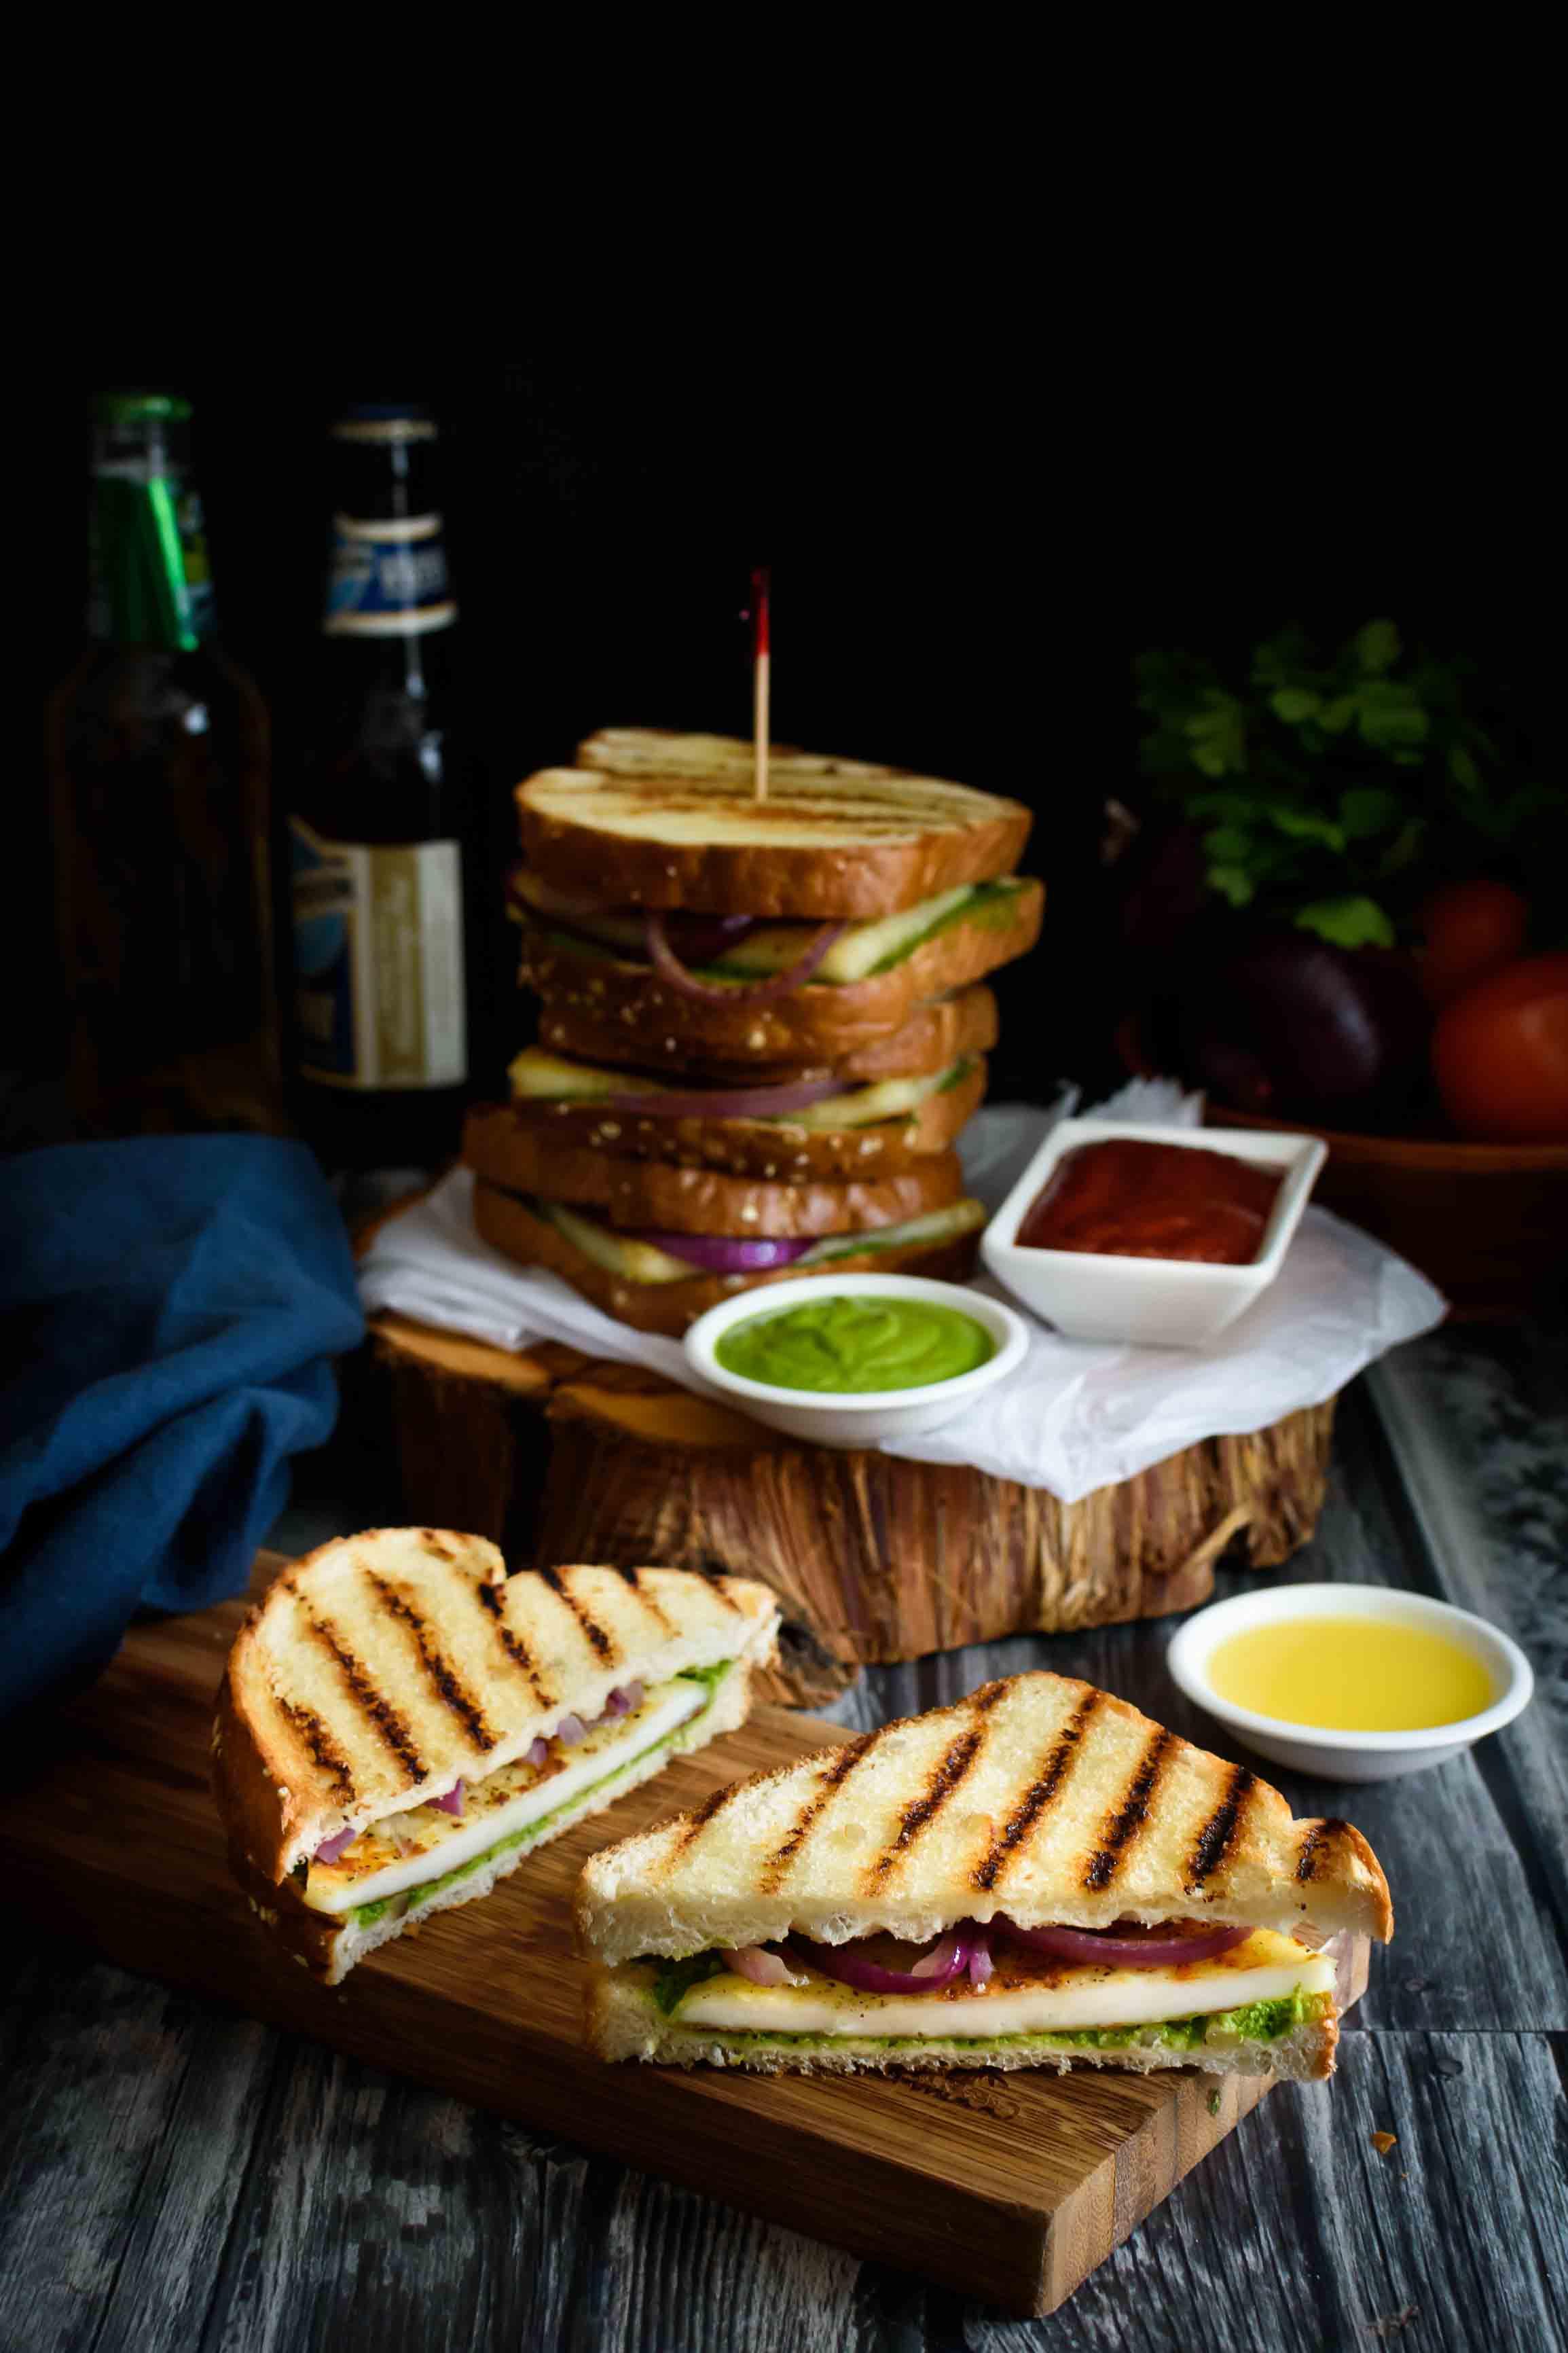 Paneer sandwich with cilantro sesame sauce- Pepper Delight #pepperdelightblog #recipe #paneer #sandwich #paneersandwich #kidslunchboxideas #meatlessmonday #vegeterian #veggiesandwich #easydinner #lunchbox #indiansandwich #sesamesauce #cottagecheese #healthy